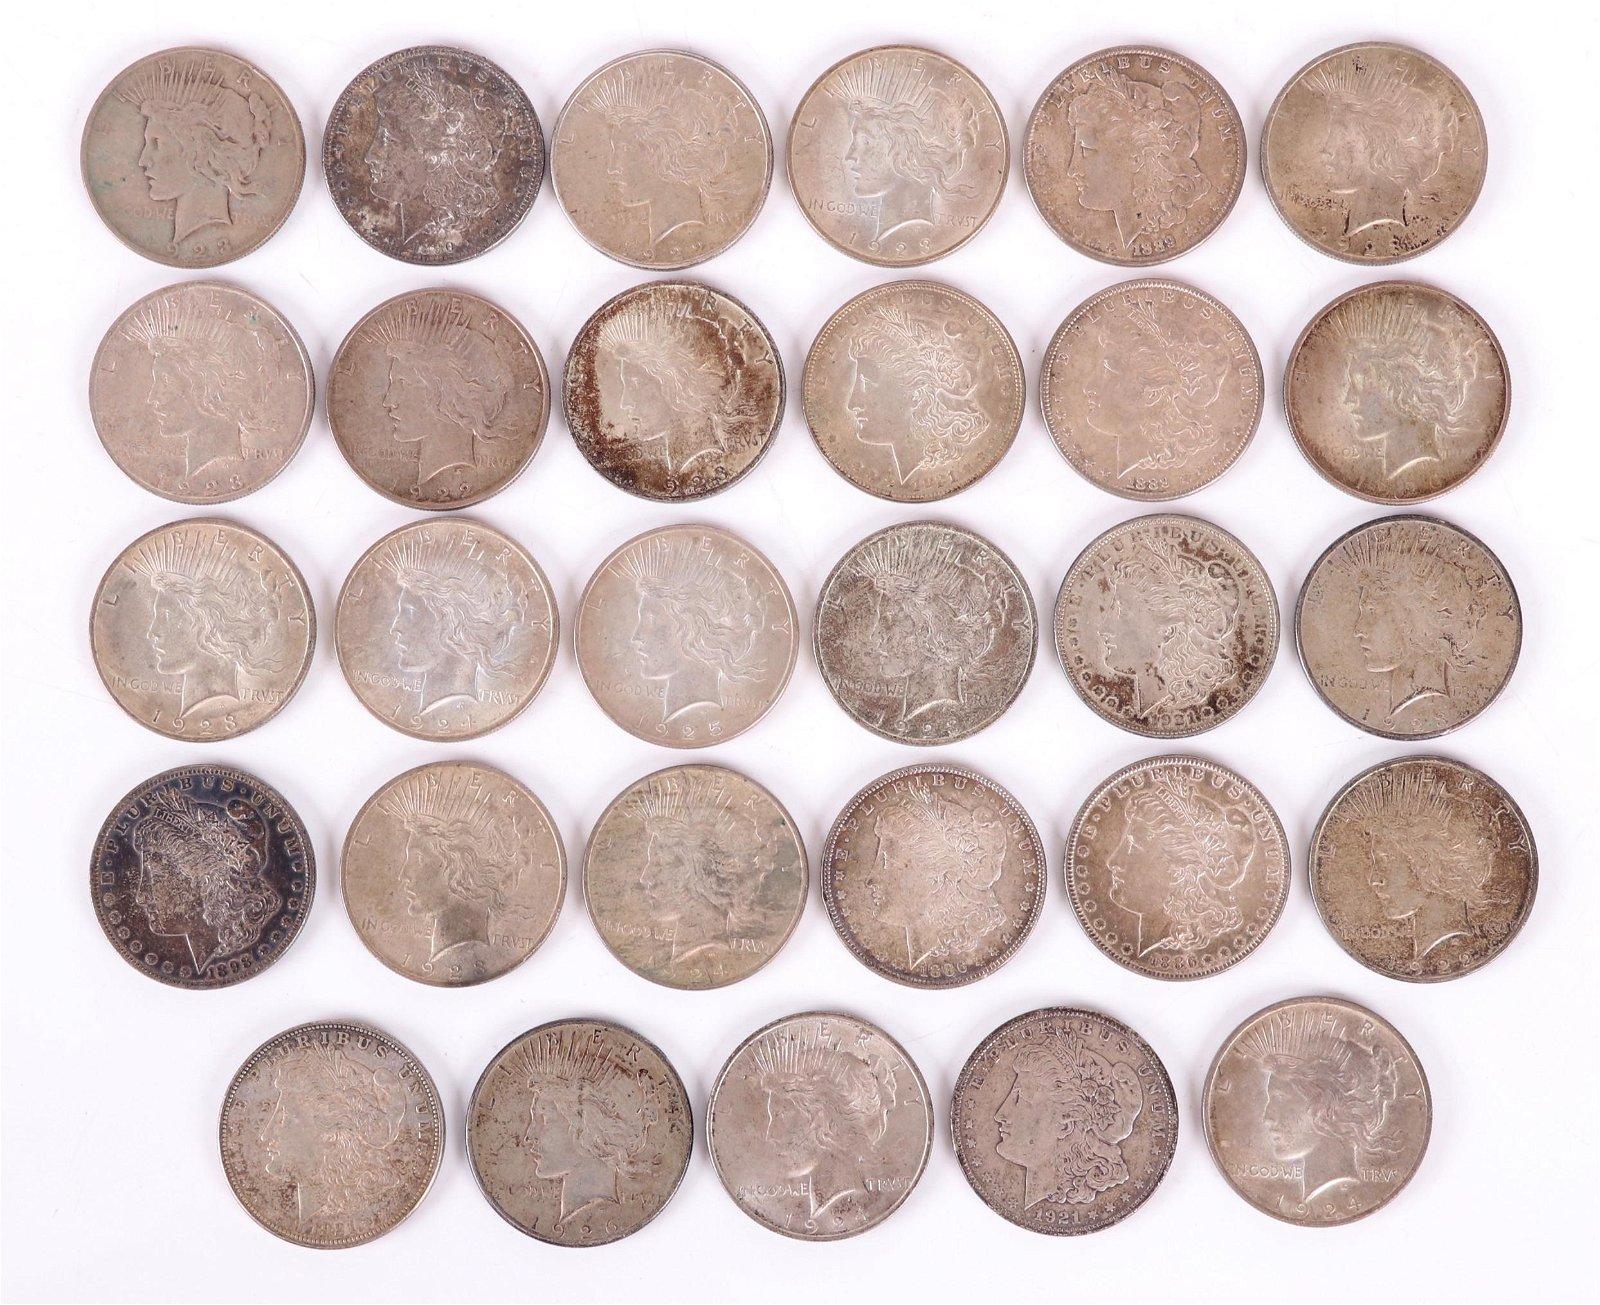 U.S. Silver Coins: 29 Morgan and Peace Dollars